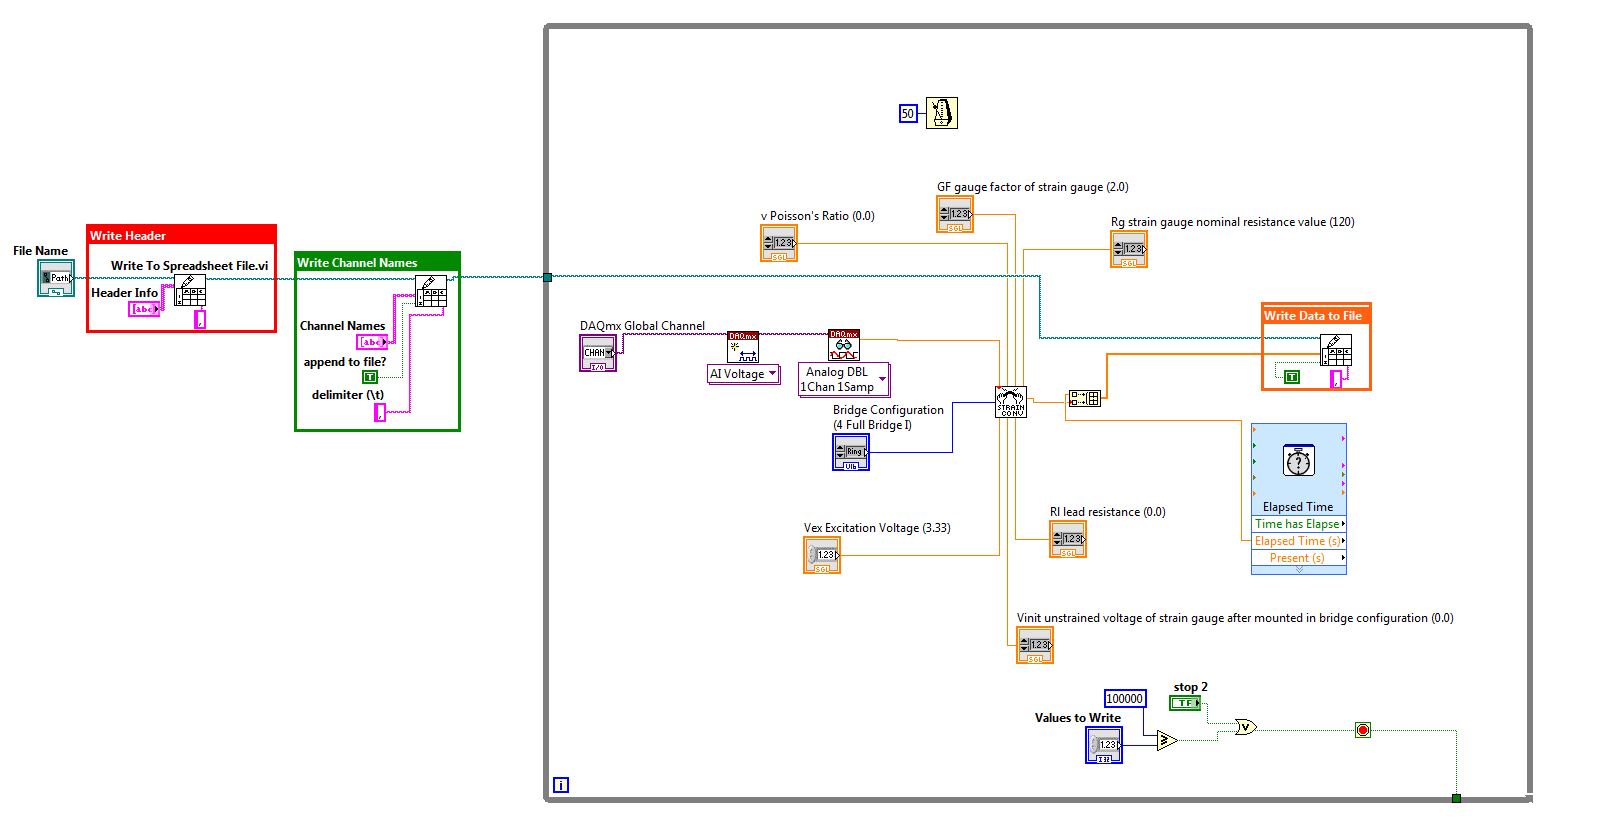 WRG-4500] Strain e Wiring Diagram on